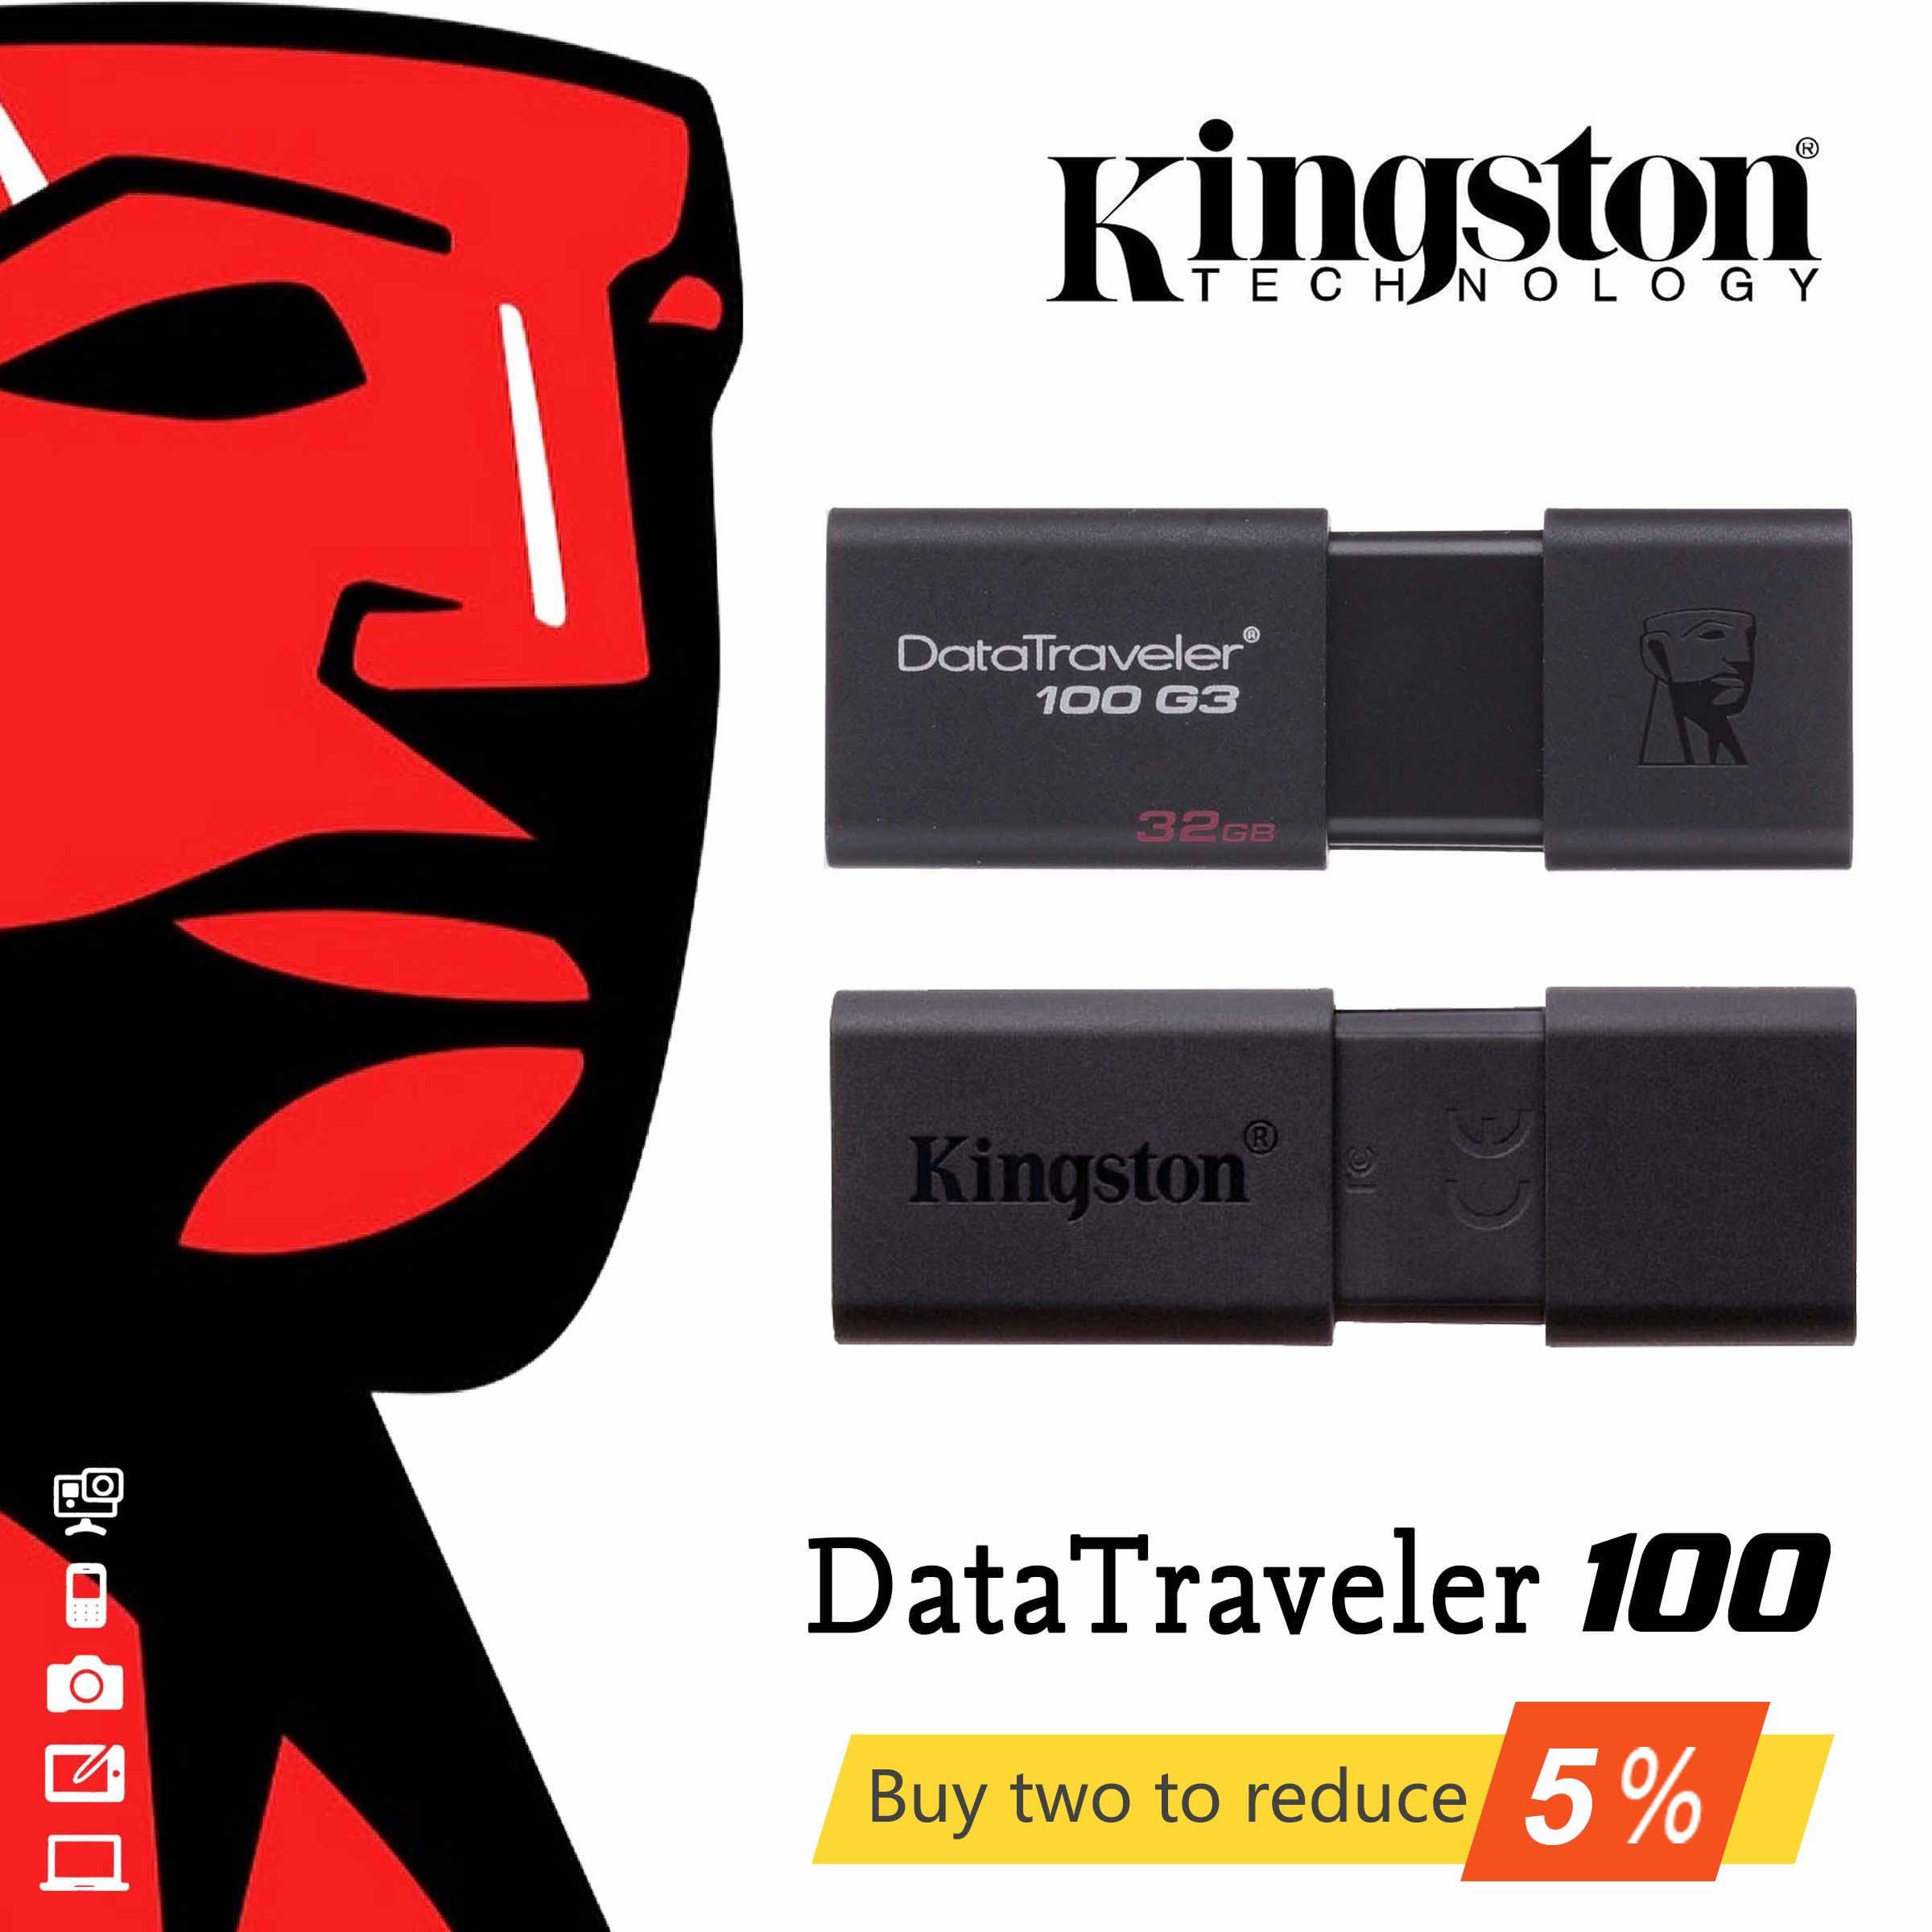 USB 3,0 флеш-накопитель DataTraveler Kingston, 16 ГБ, 32 ГБ, 64 ГБ, 16, 32, 64 ГБ, DT100G3